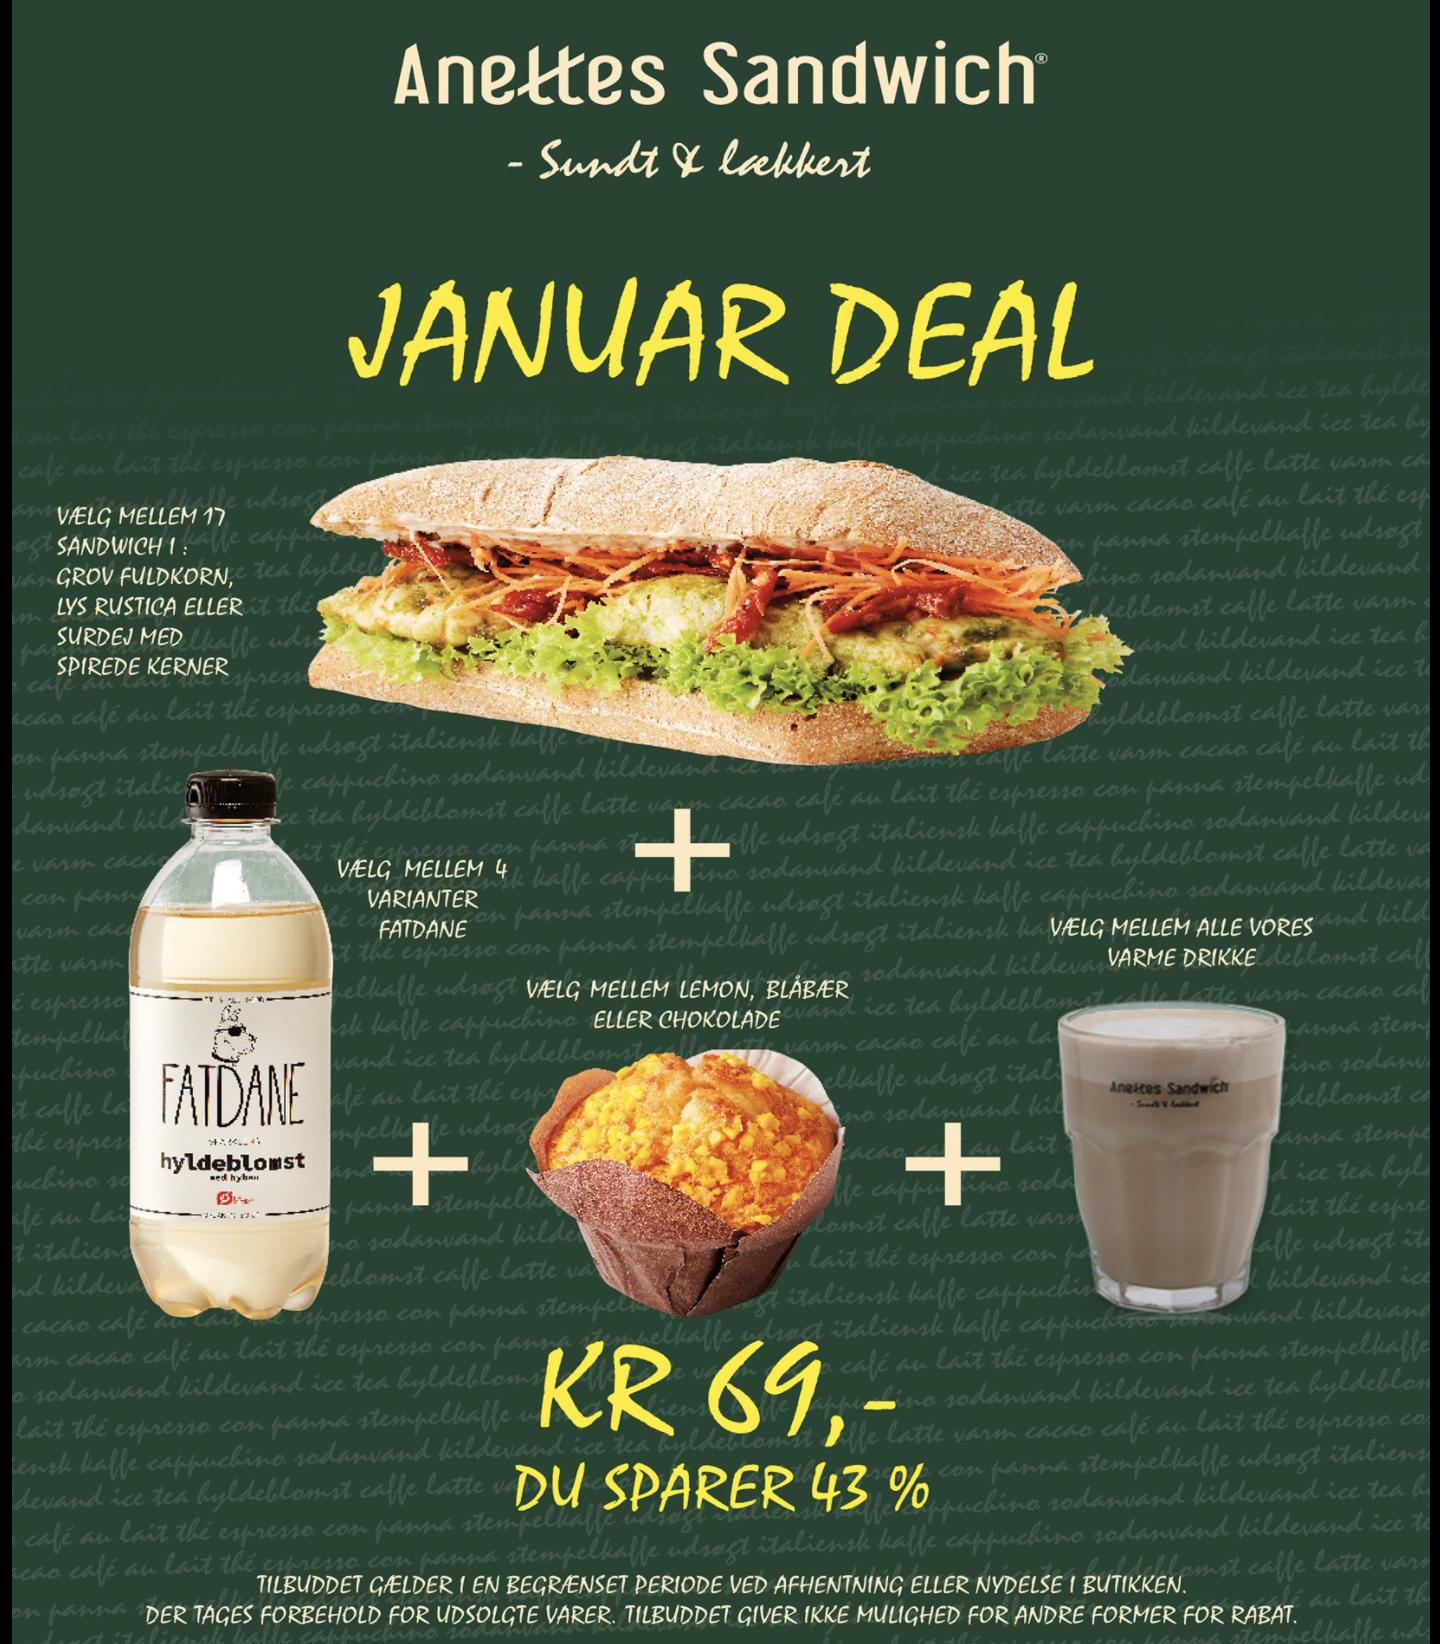 43% rabat: Aarhusiansk sandwichkæde sænker priserne på takeaway